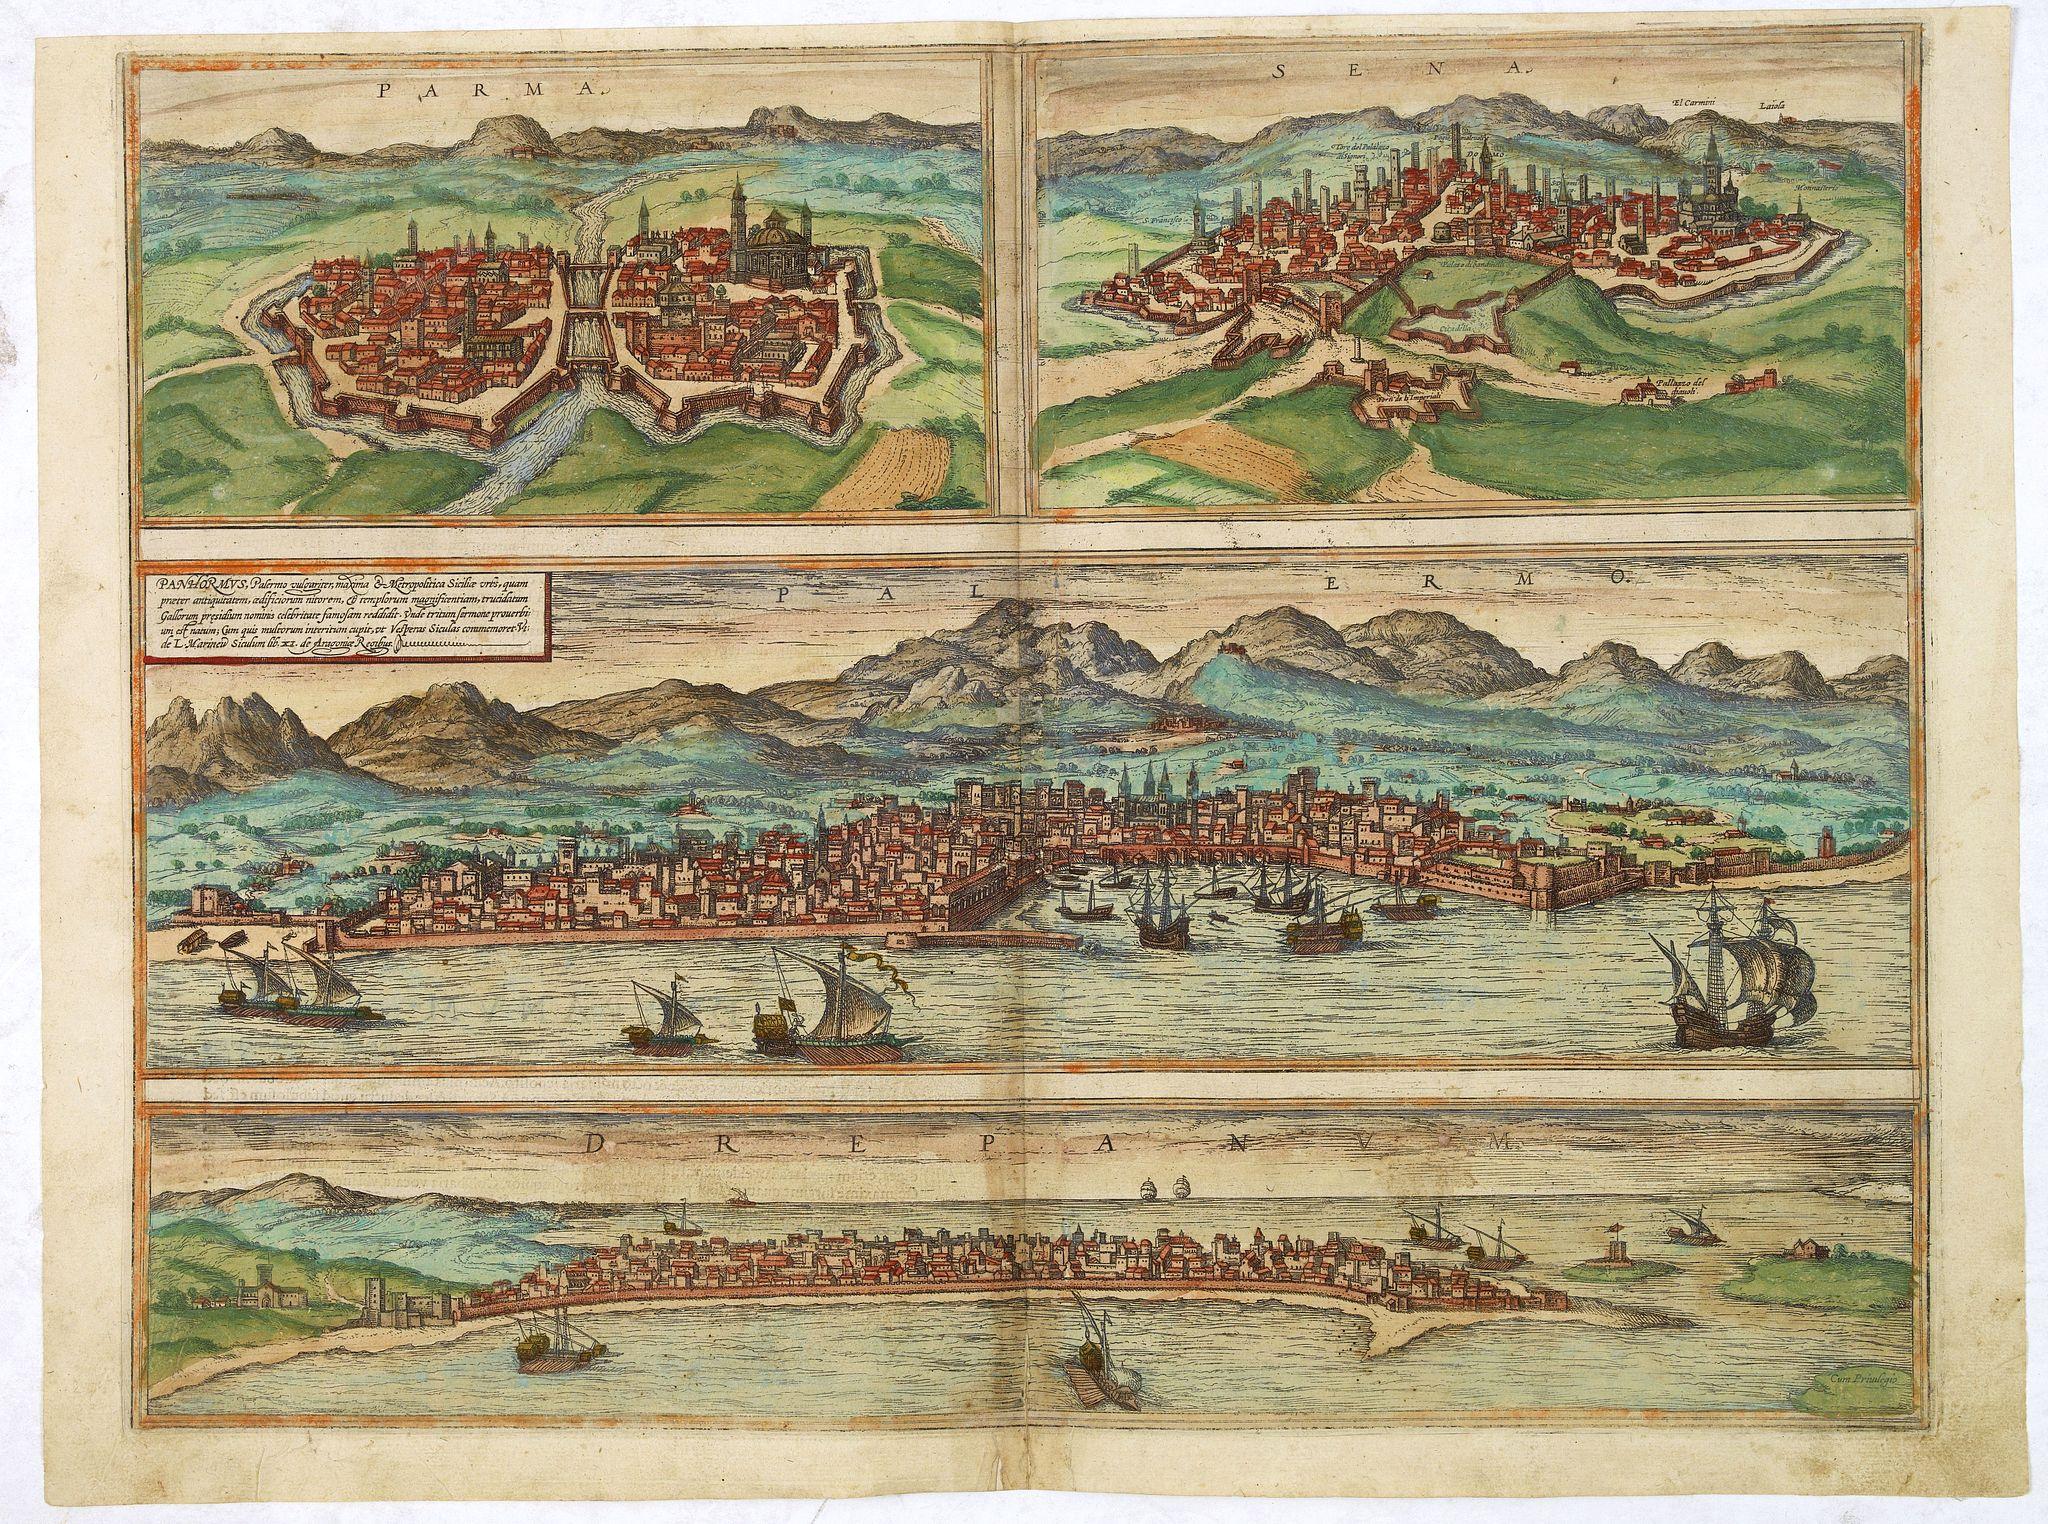 BRAUN,G. / HOGENBERG, F. -  Parma [on sheet with] Sena [and] Panhormus, Palermo vulgariter, ... [and] Drepanum (Trapani)